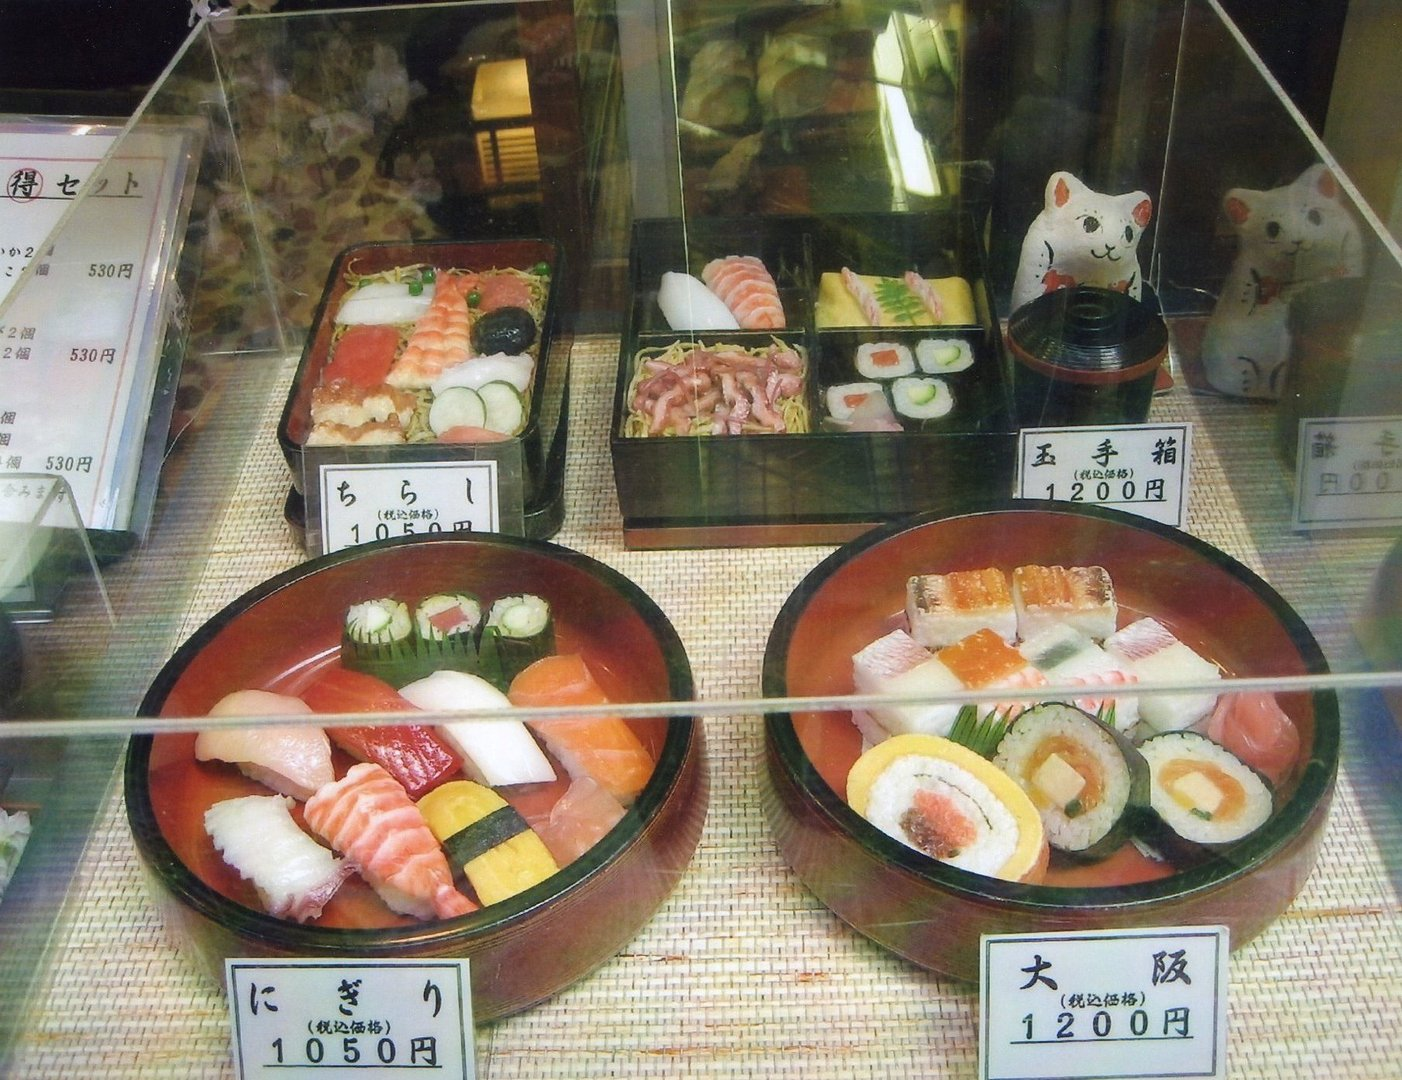 (tipici piatti giapponesi)